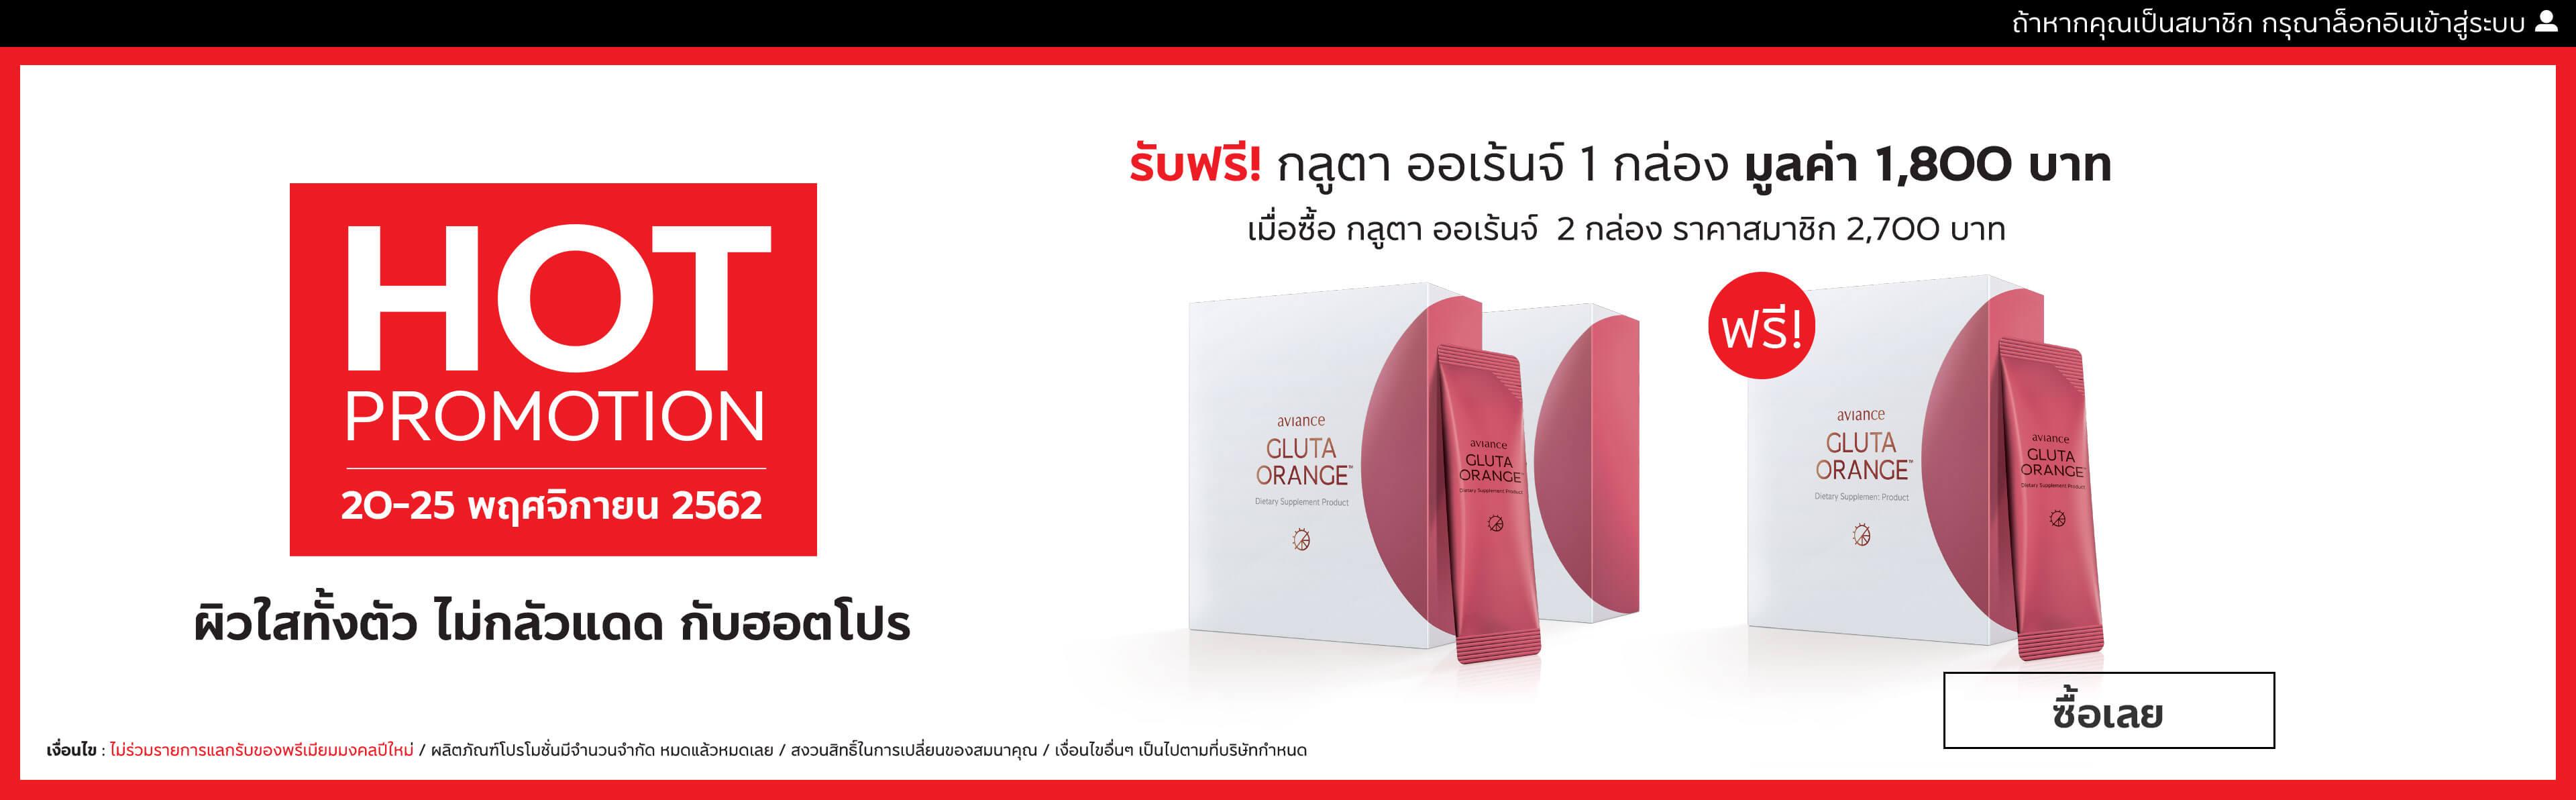 aviance Gluta Orange โปรโมชั่น ซื้อ 2 แถม 1